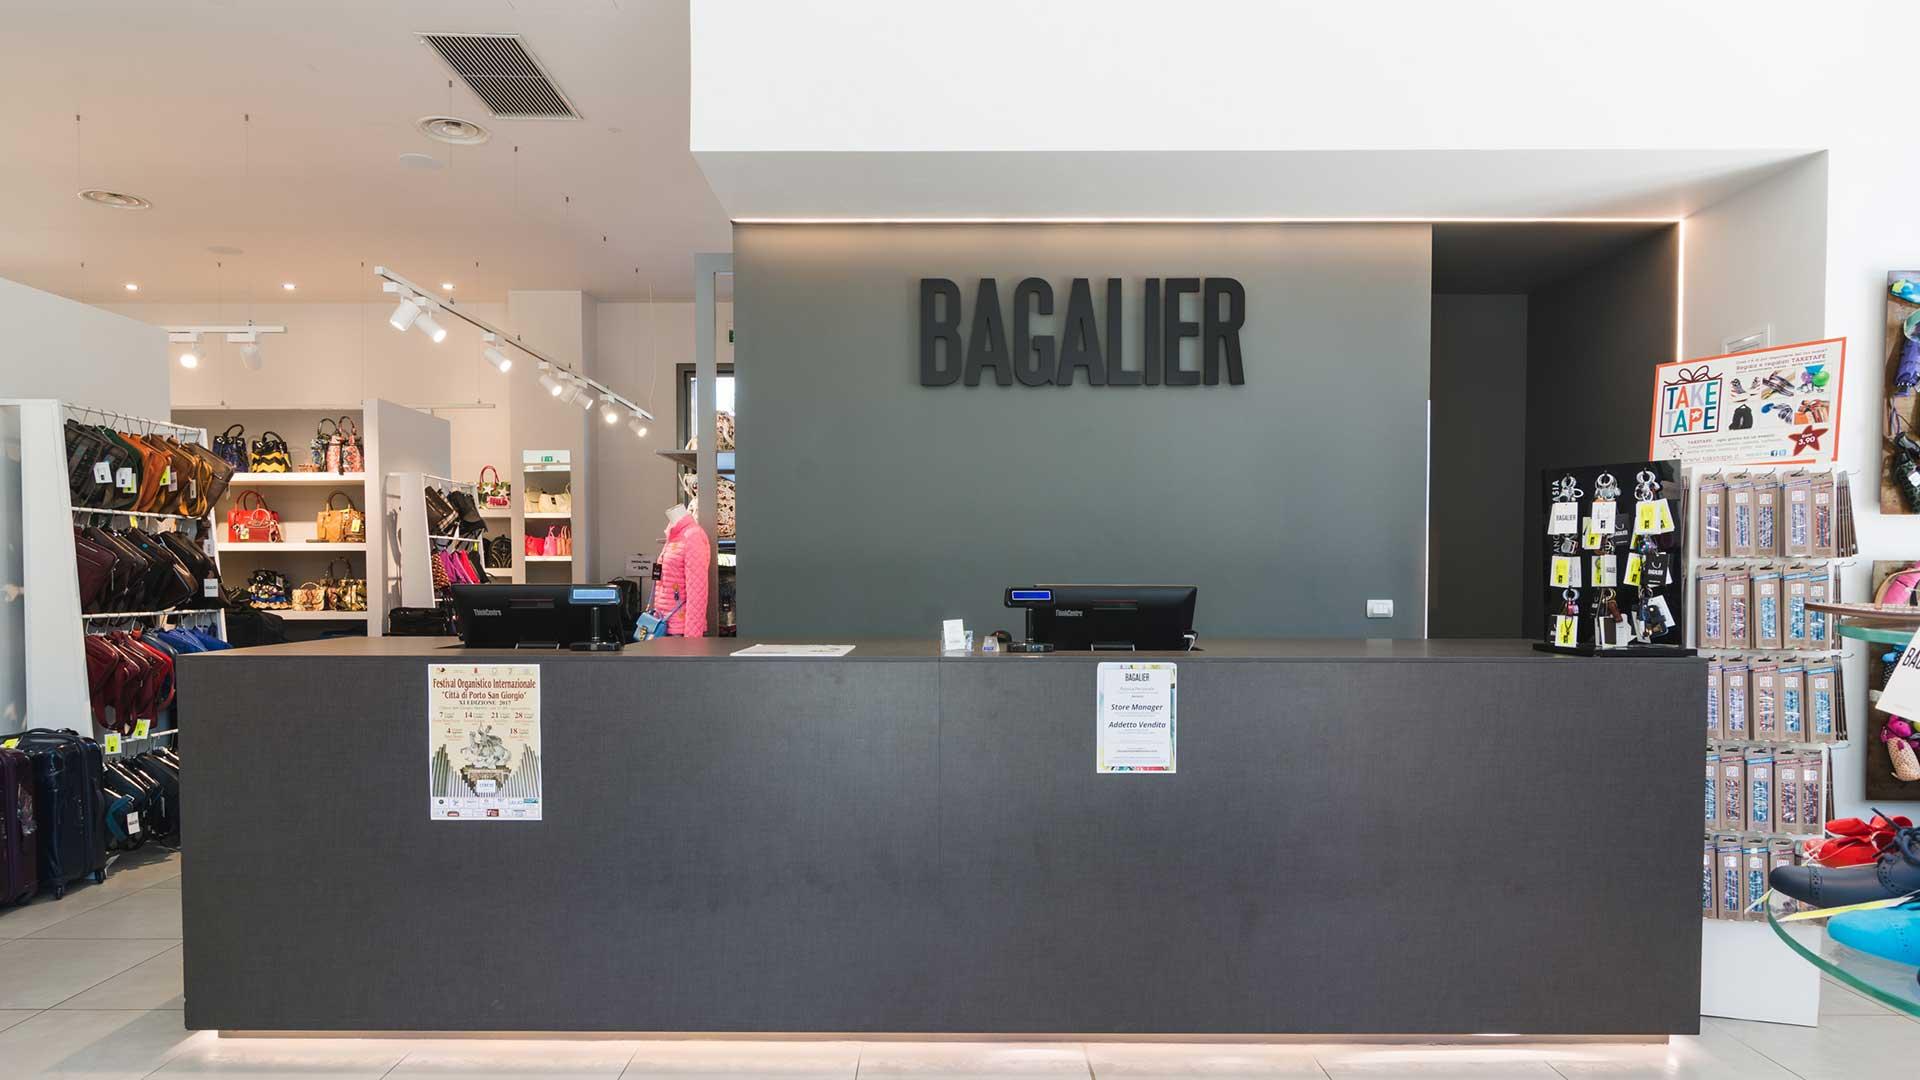 bagalier-7